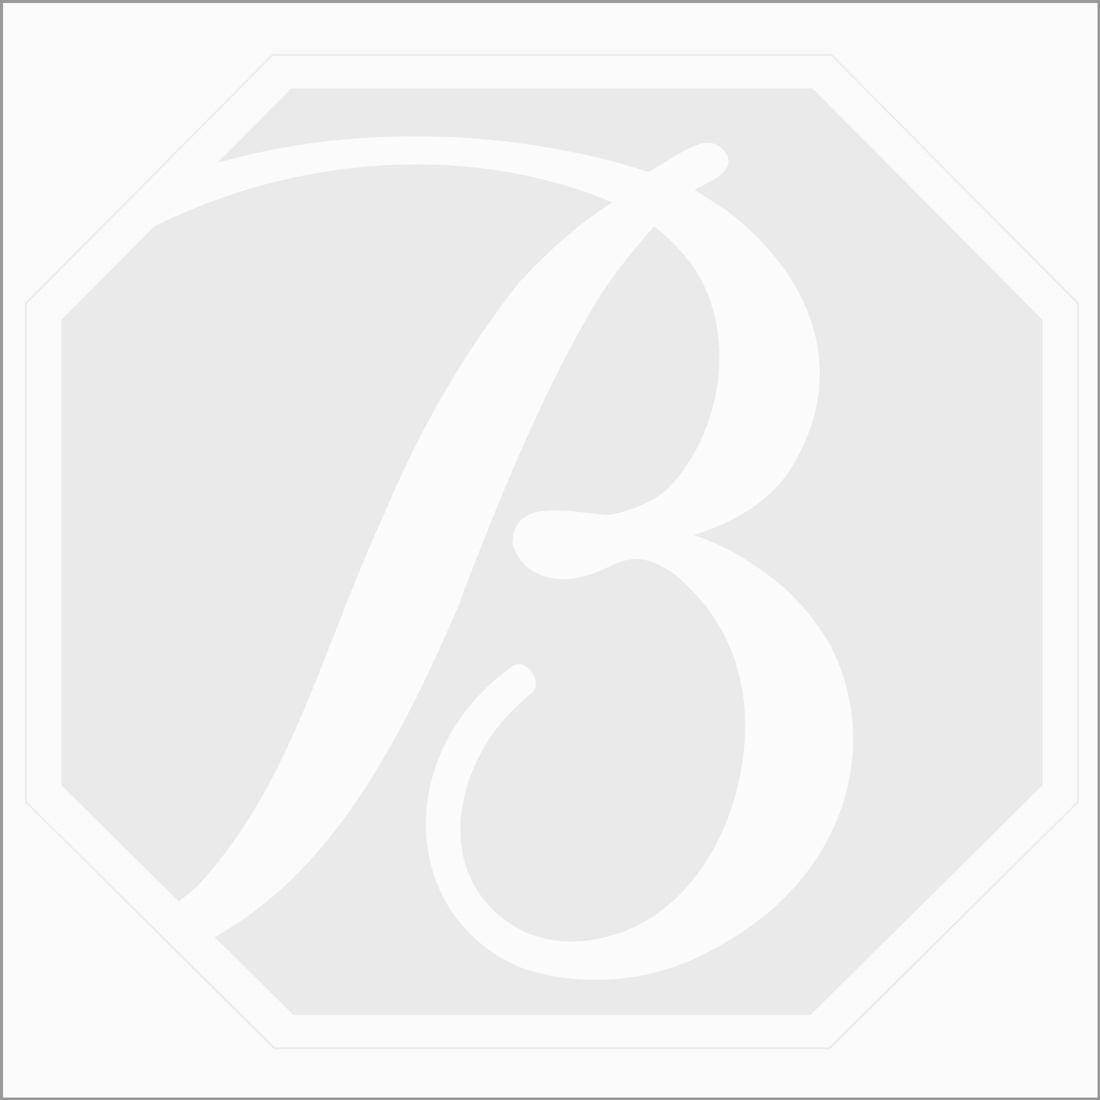 6 Pcs - Light Blue Aquamarine Rose Cut - 50.84 ct. - 20.1 x 16.3 mm to 36 x 16.8 mm (AQRC1027)